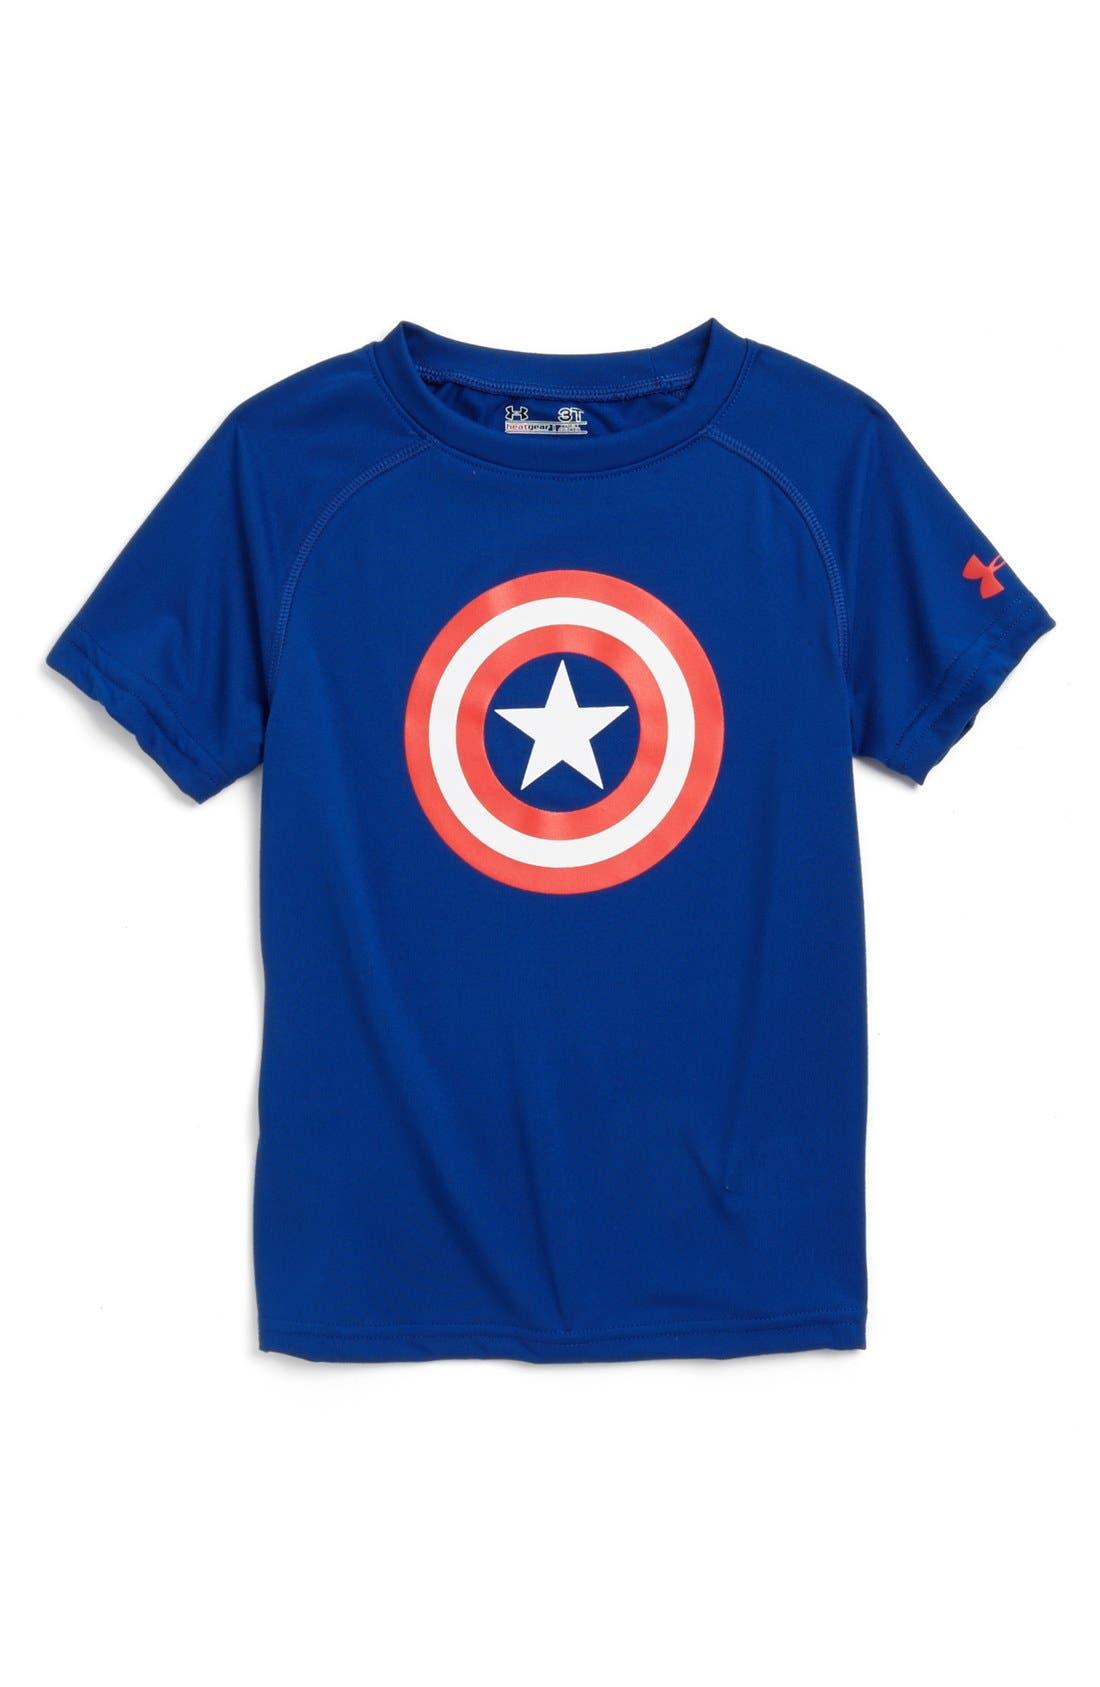 Alternate Image 1 Selected - Under Armour 'Alter Ego - Captain America' HeatGear® T-Shirt (Little Boys)